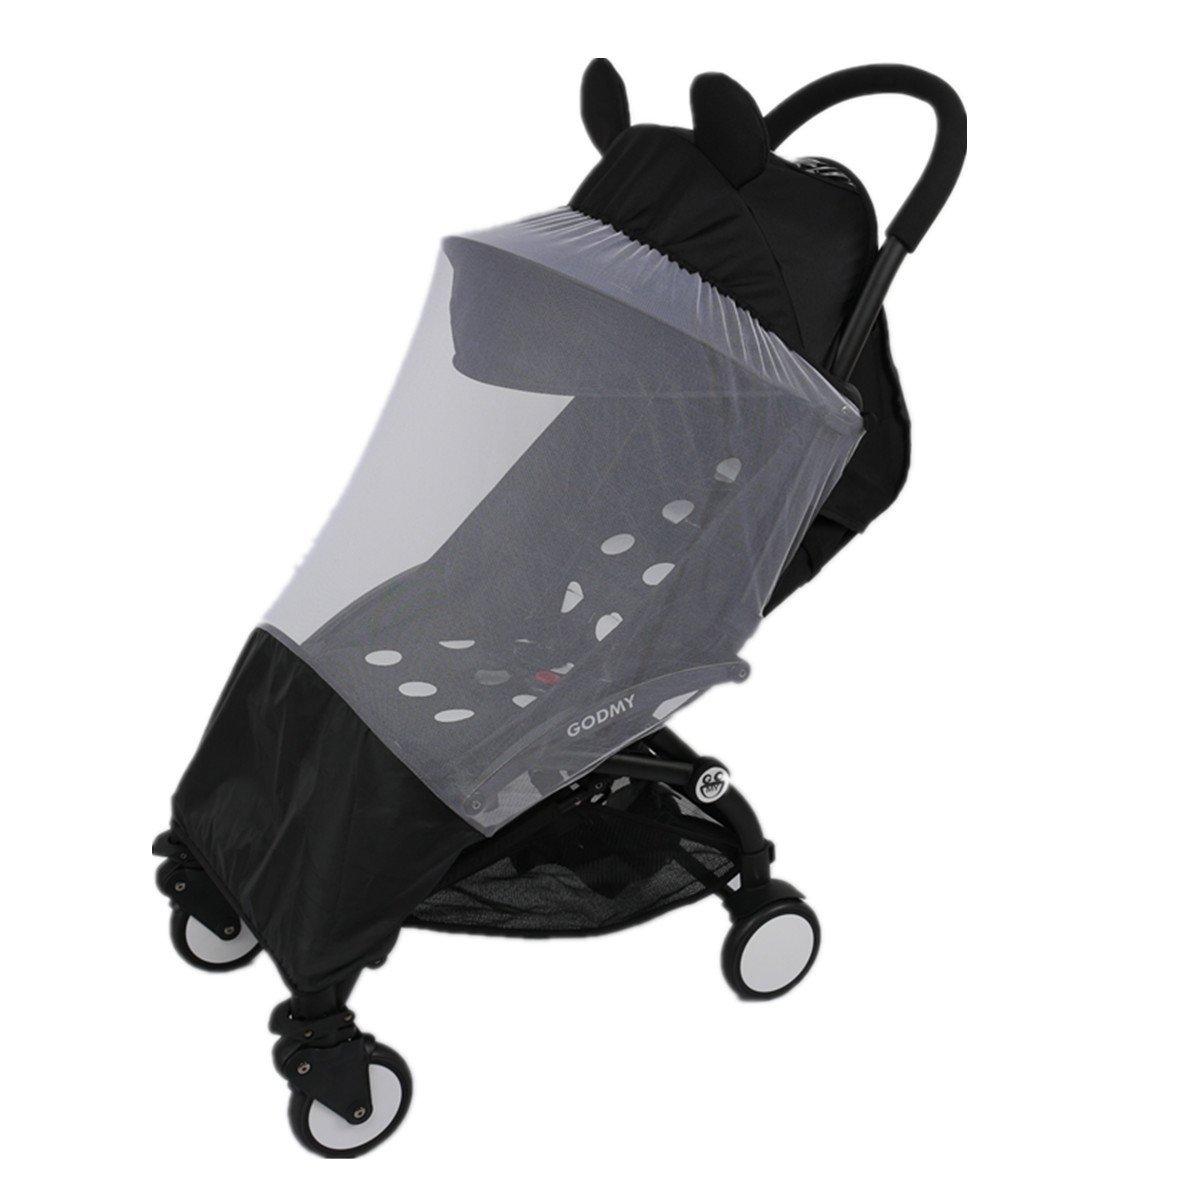 Insect Shield Insect Netting For Babyzen YOYO YOYO+ Stroller